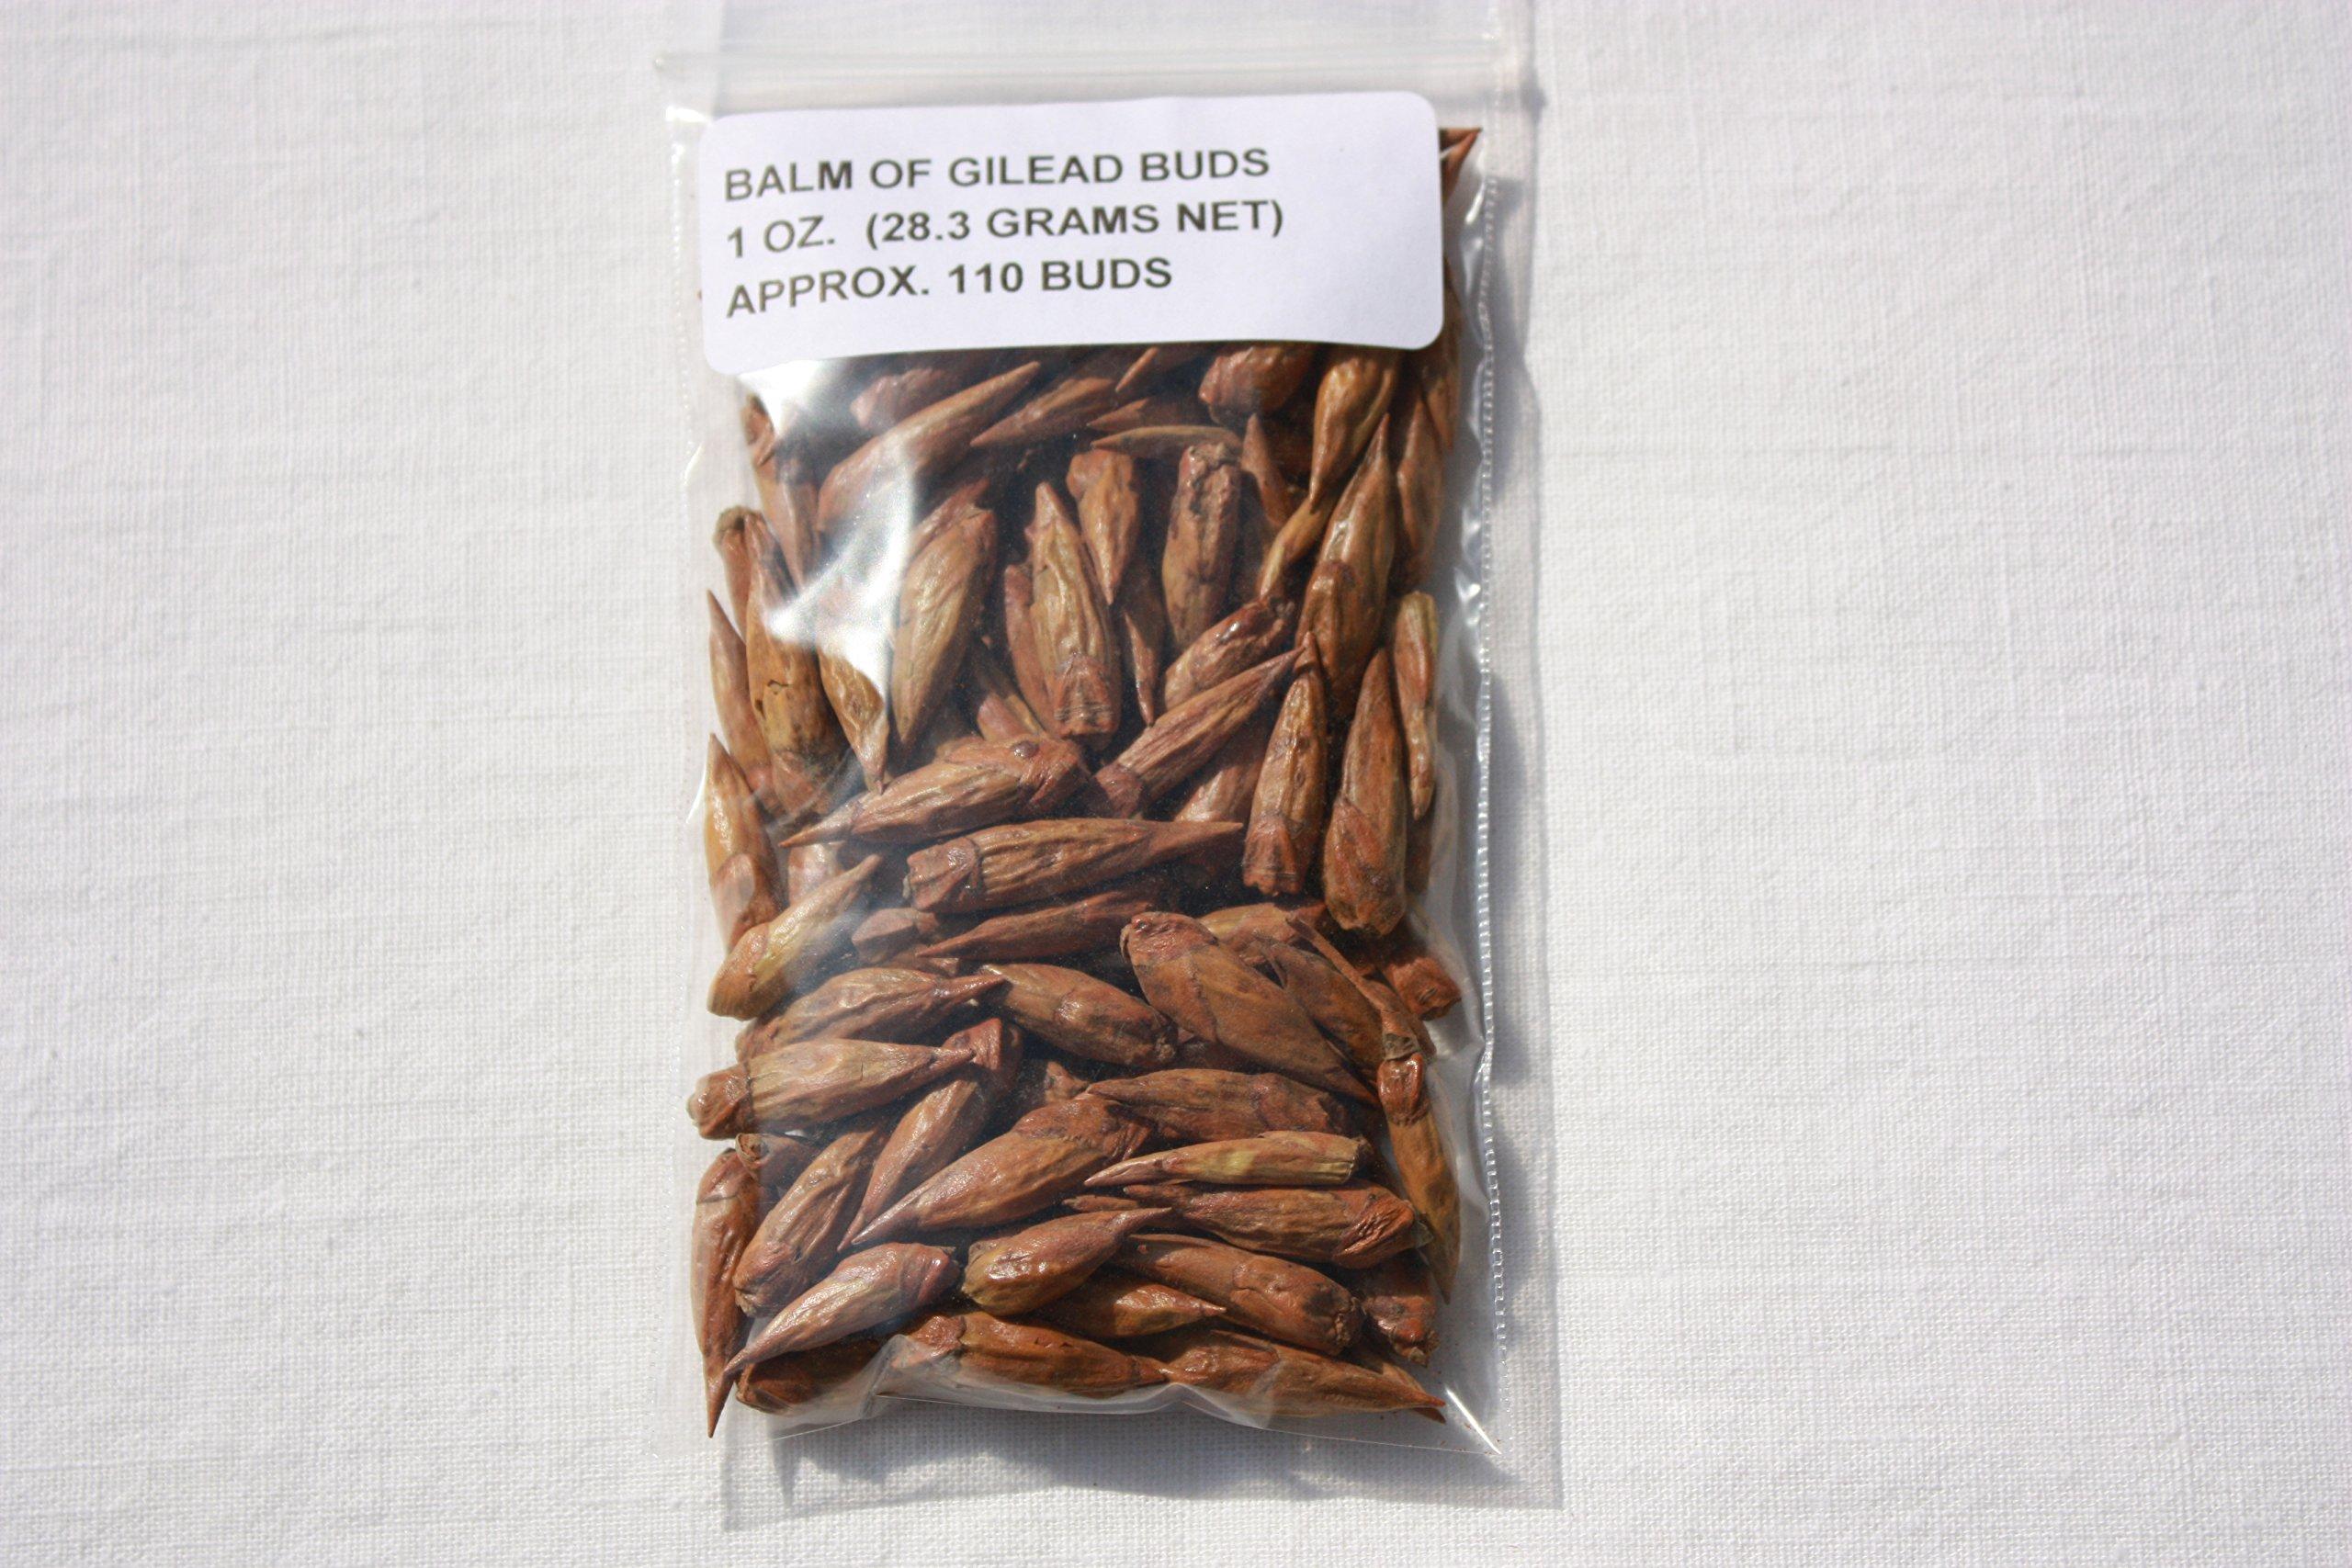 Bulk Herbs: Balm of Gilead Buds - 3 oz (Cottonwood Tree) Wicca Pagan Magick